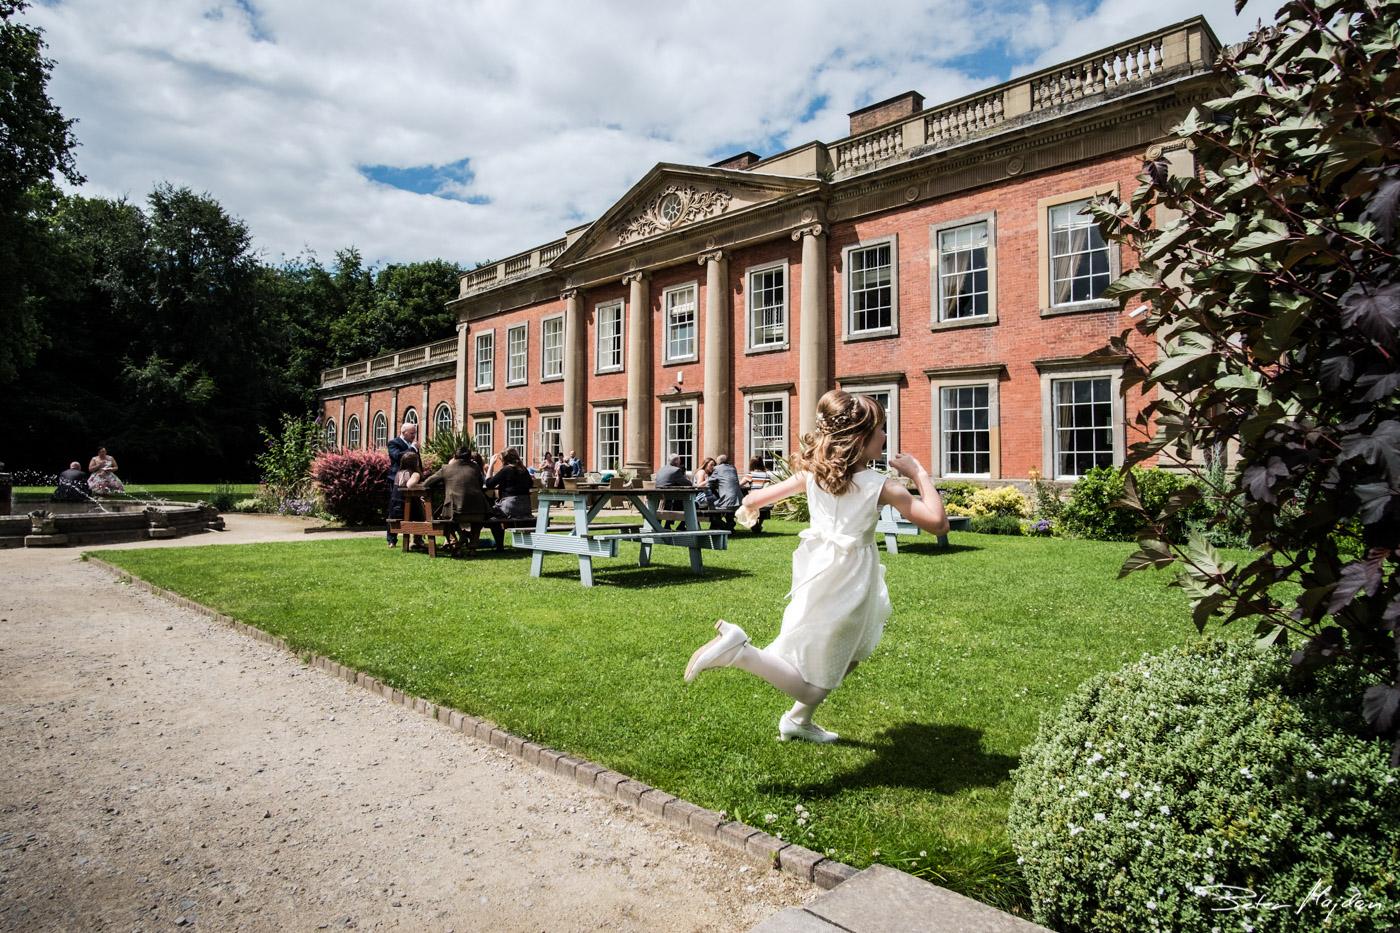 Colwick-hall-wedding-photography-32.jpg